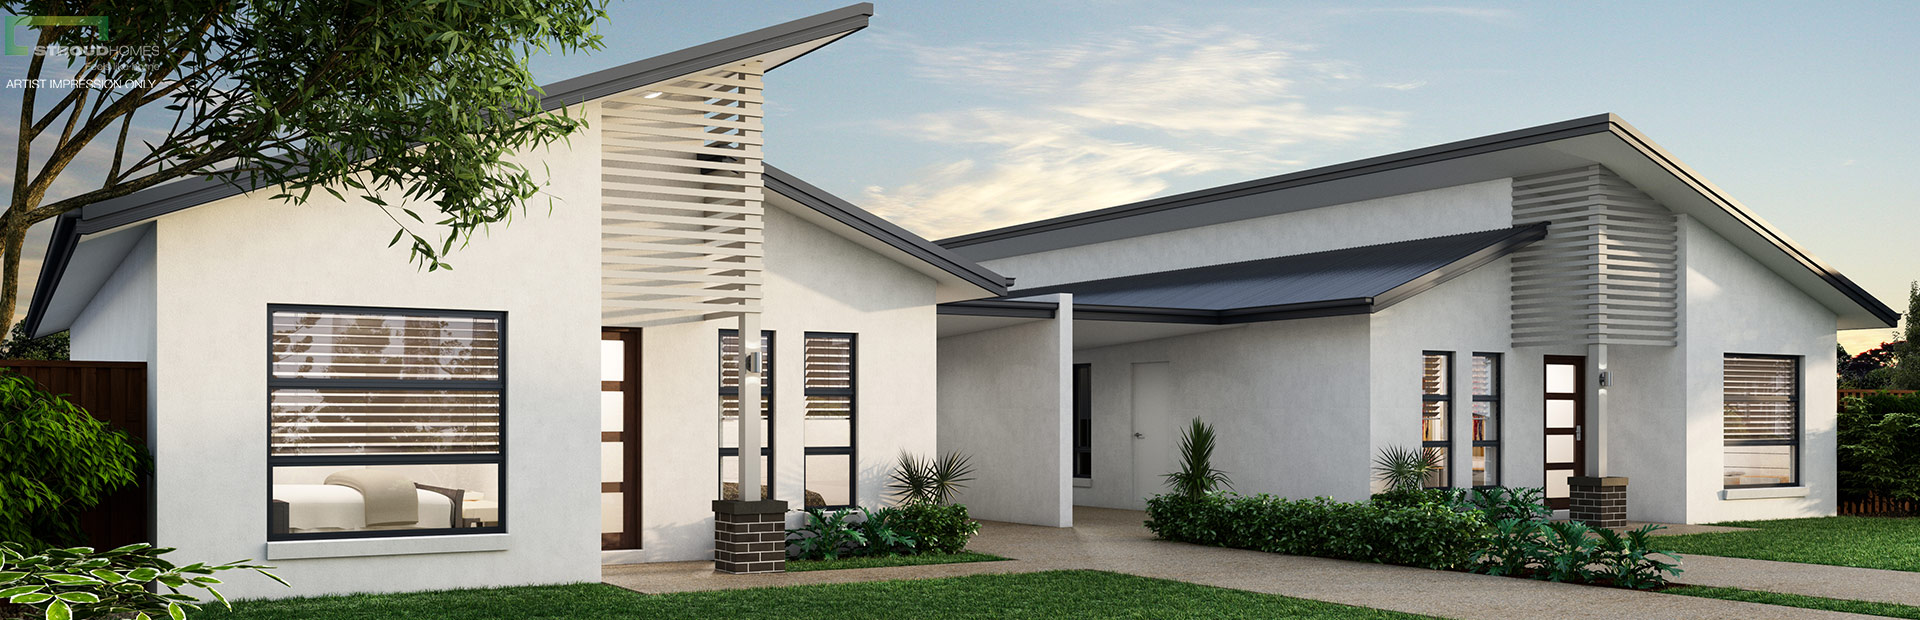 Hillary 273 Duplex Home Design Stroud Homes New Zealand